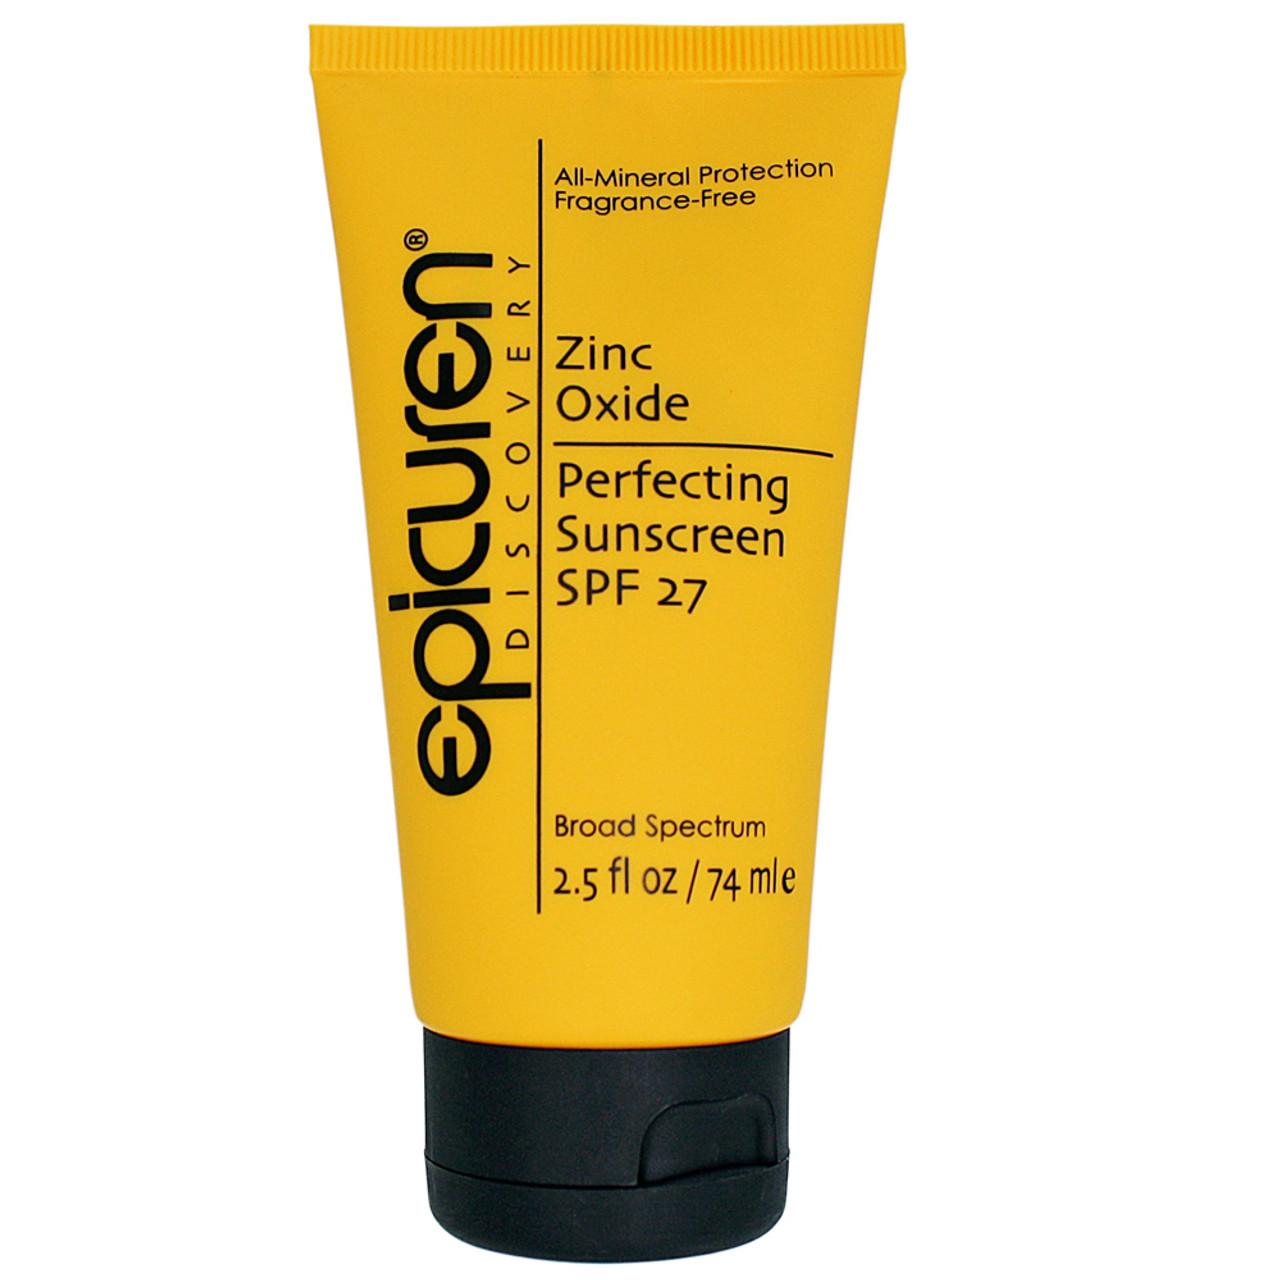 epicuren Discovery Zinc Oxide Perfecting Sunscreen SPF 27